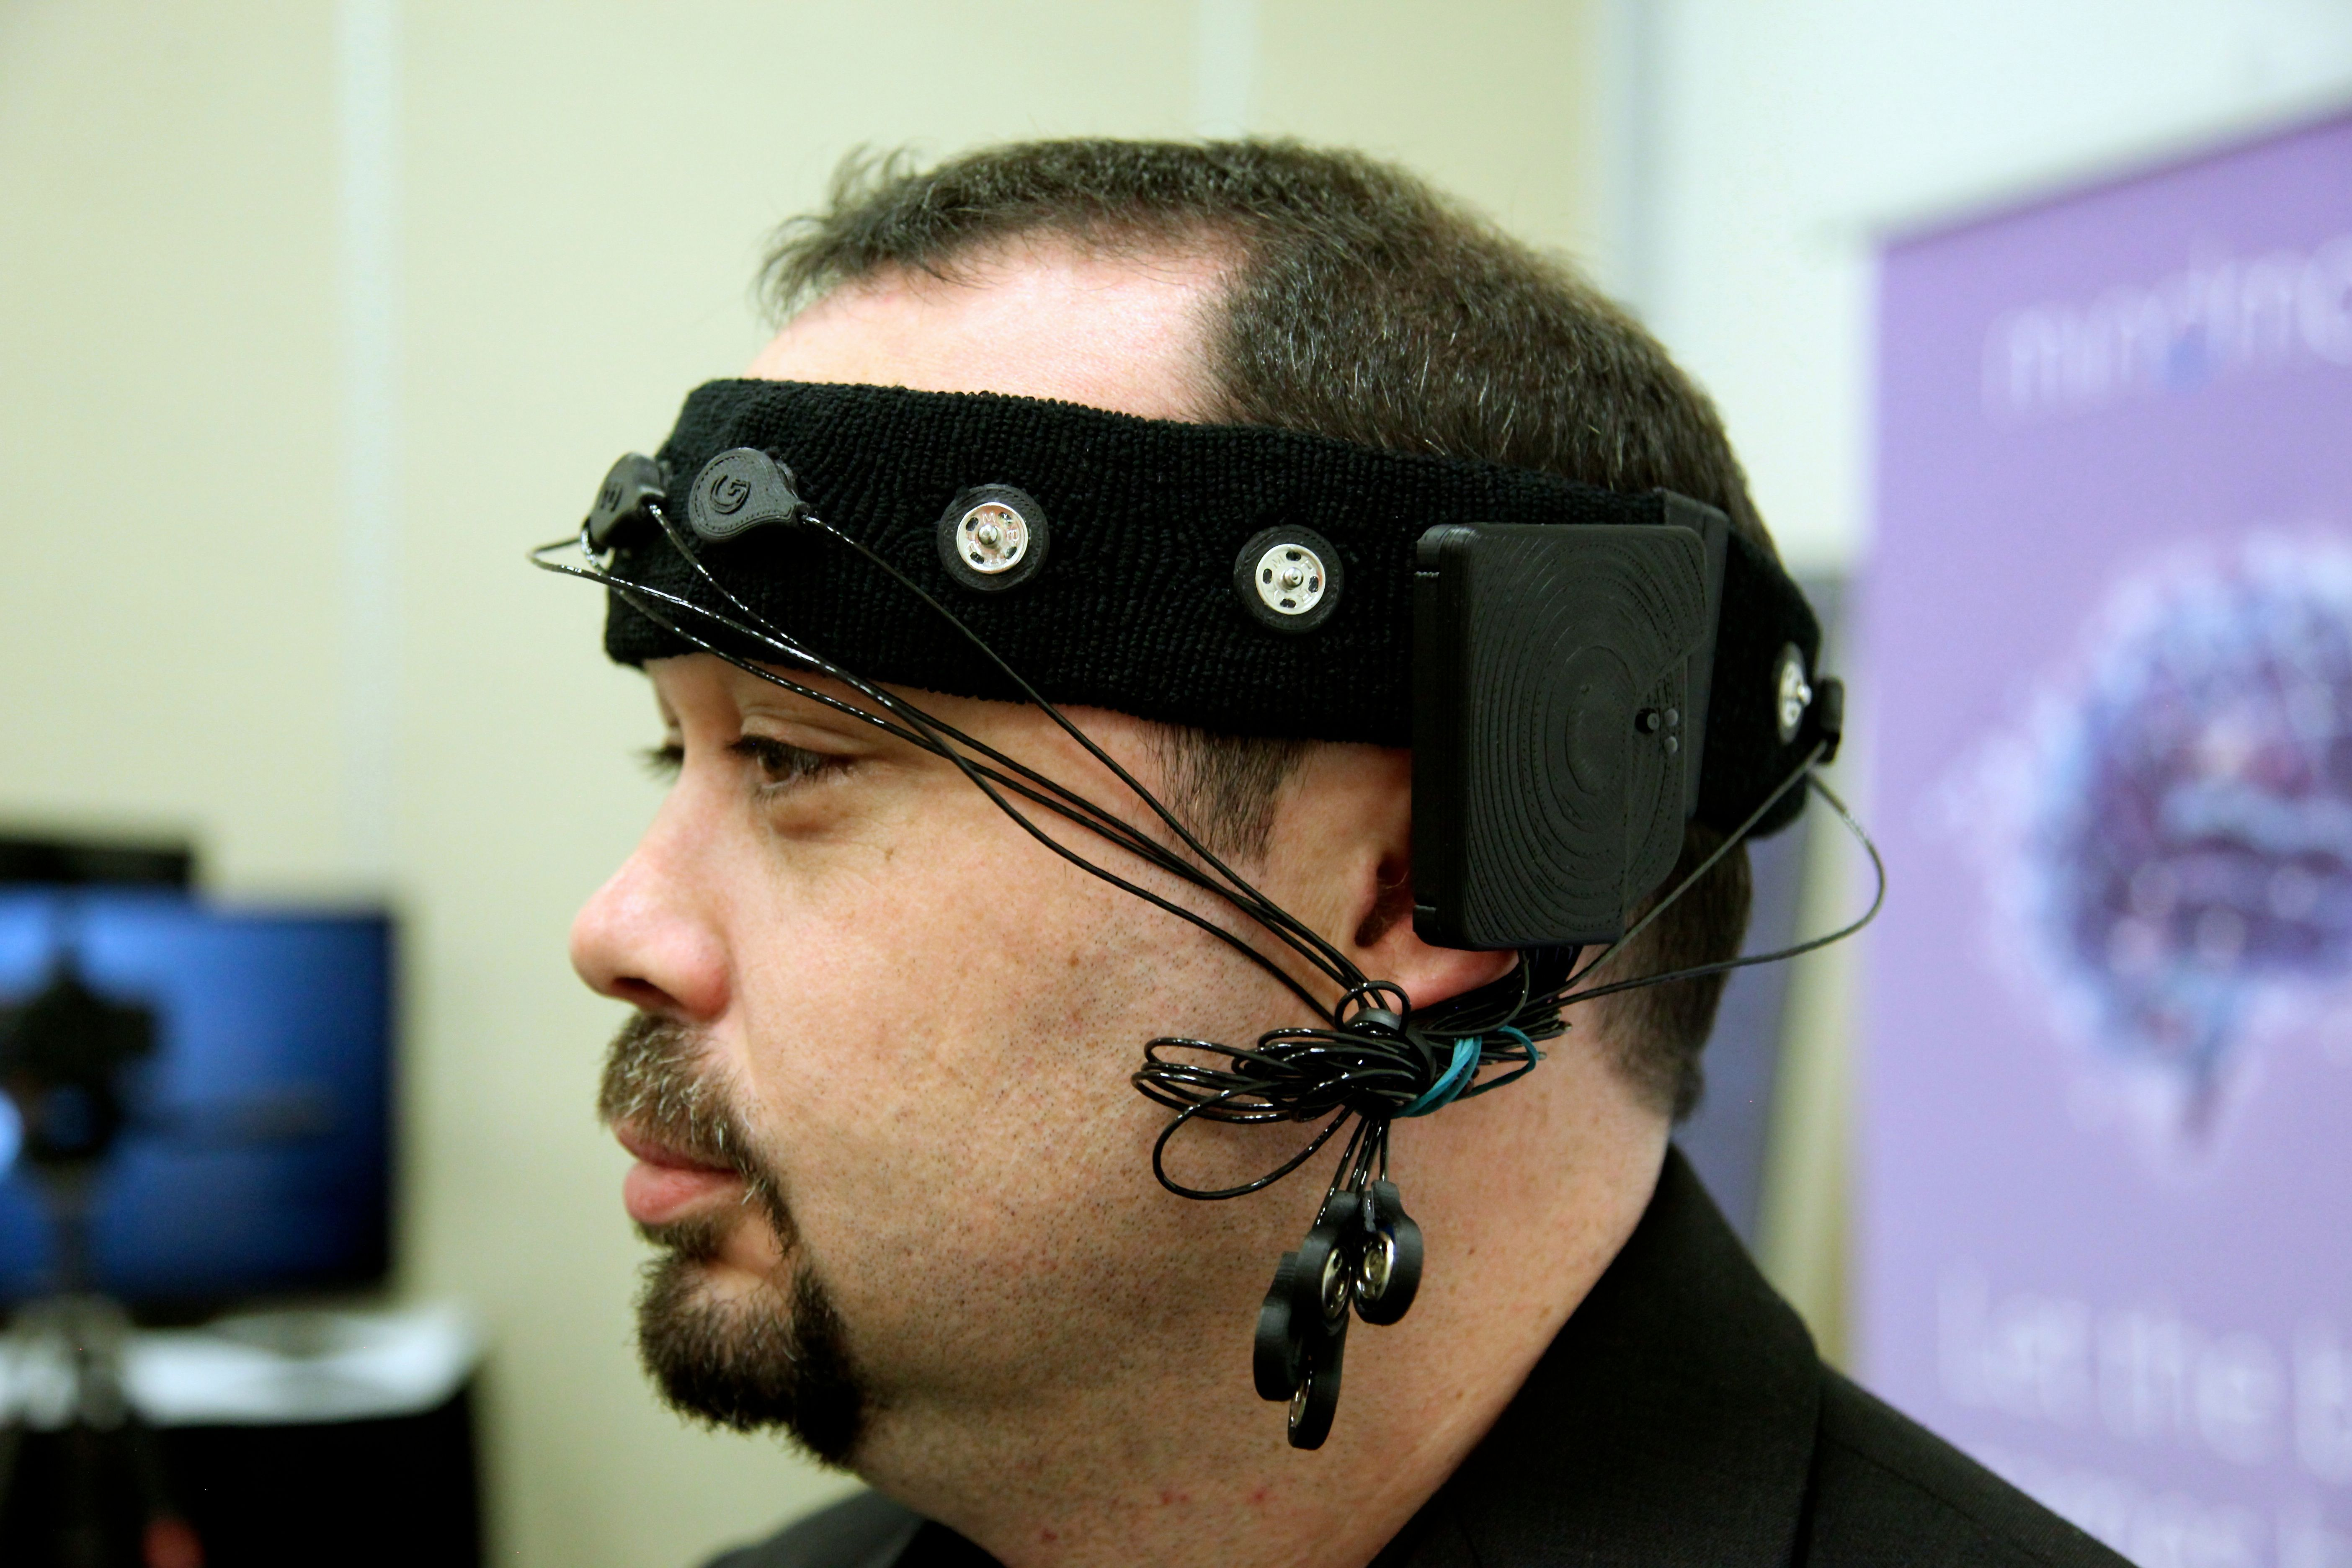 MindMaze's headset brings your brainwaves into virtual